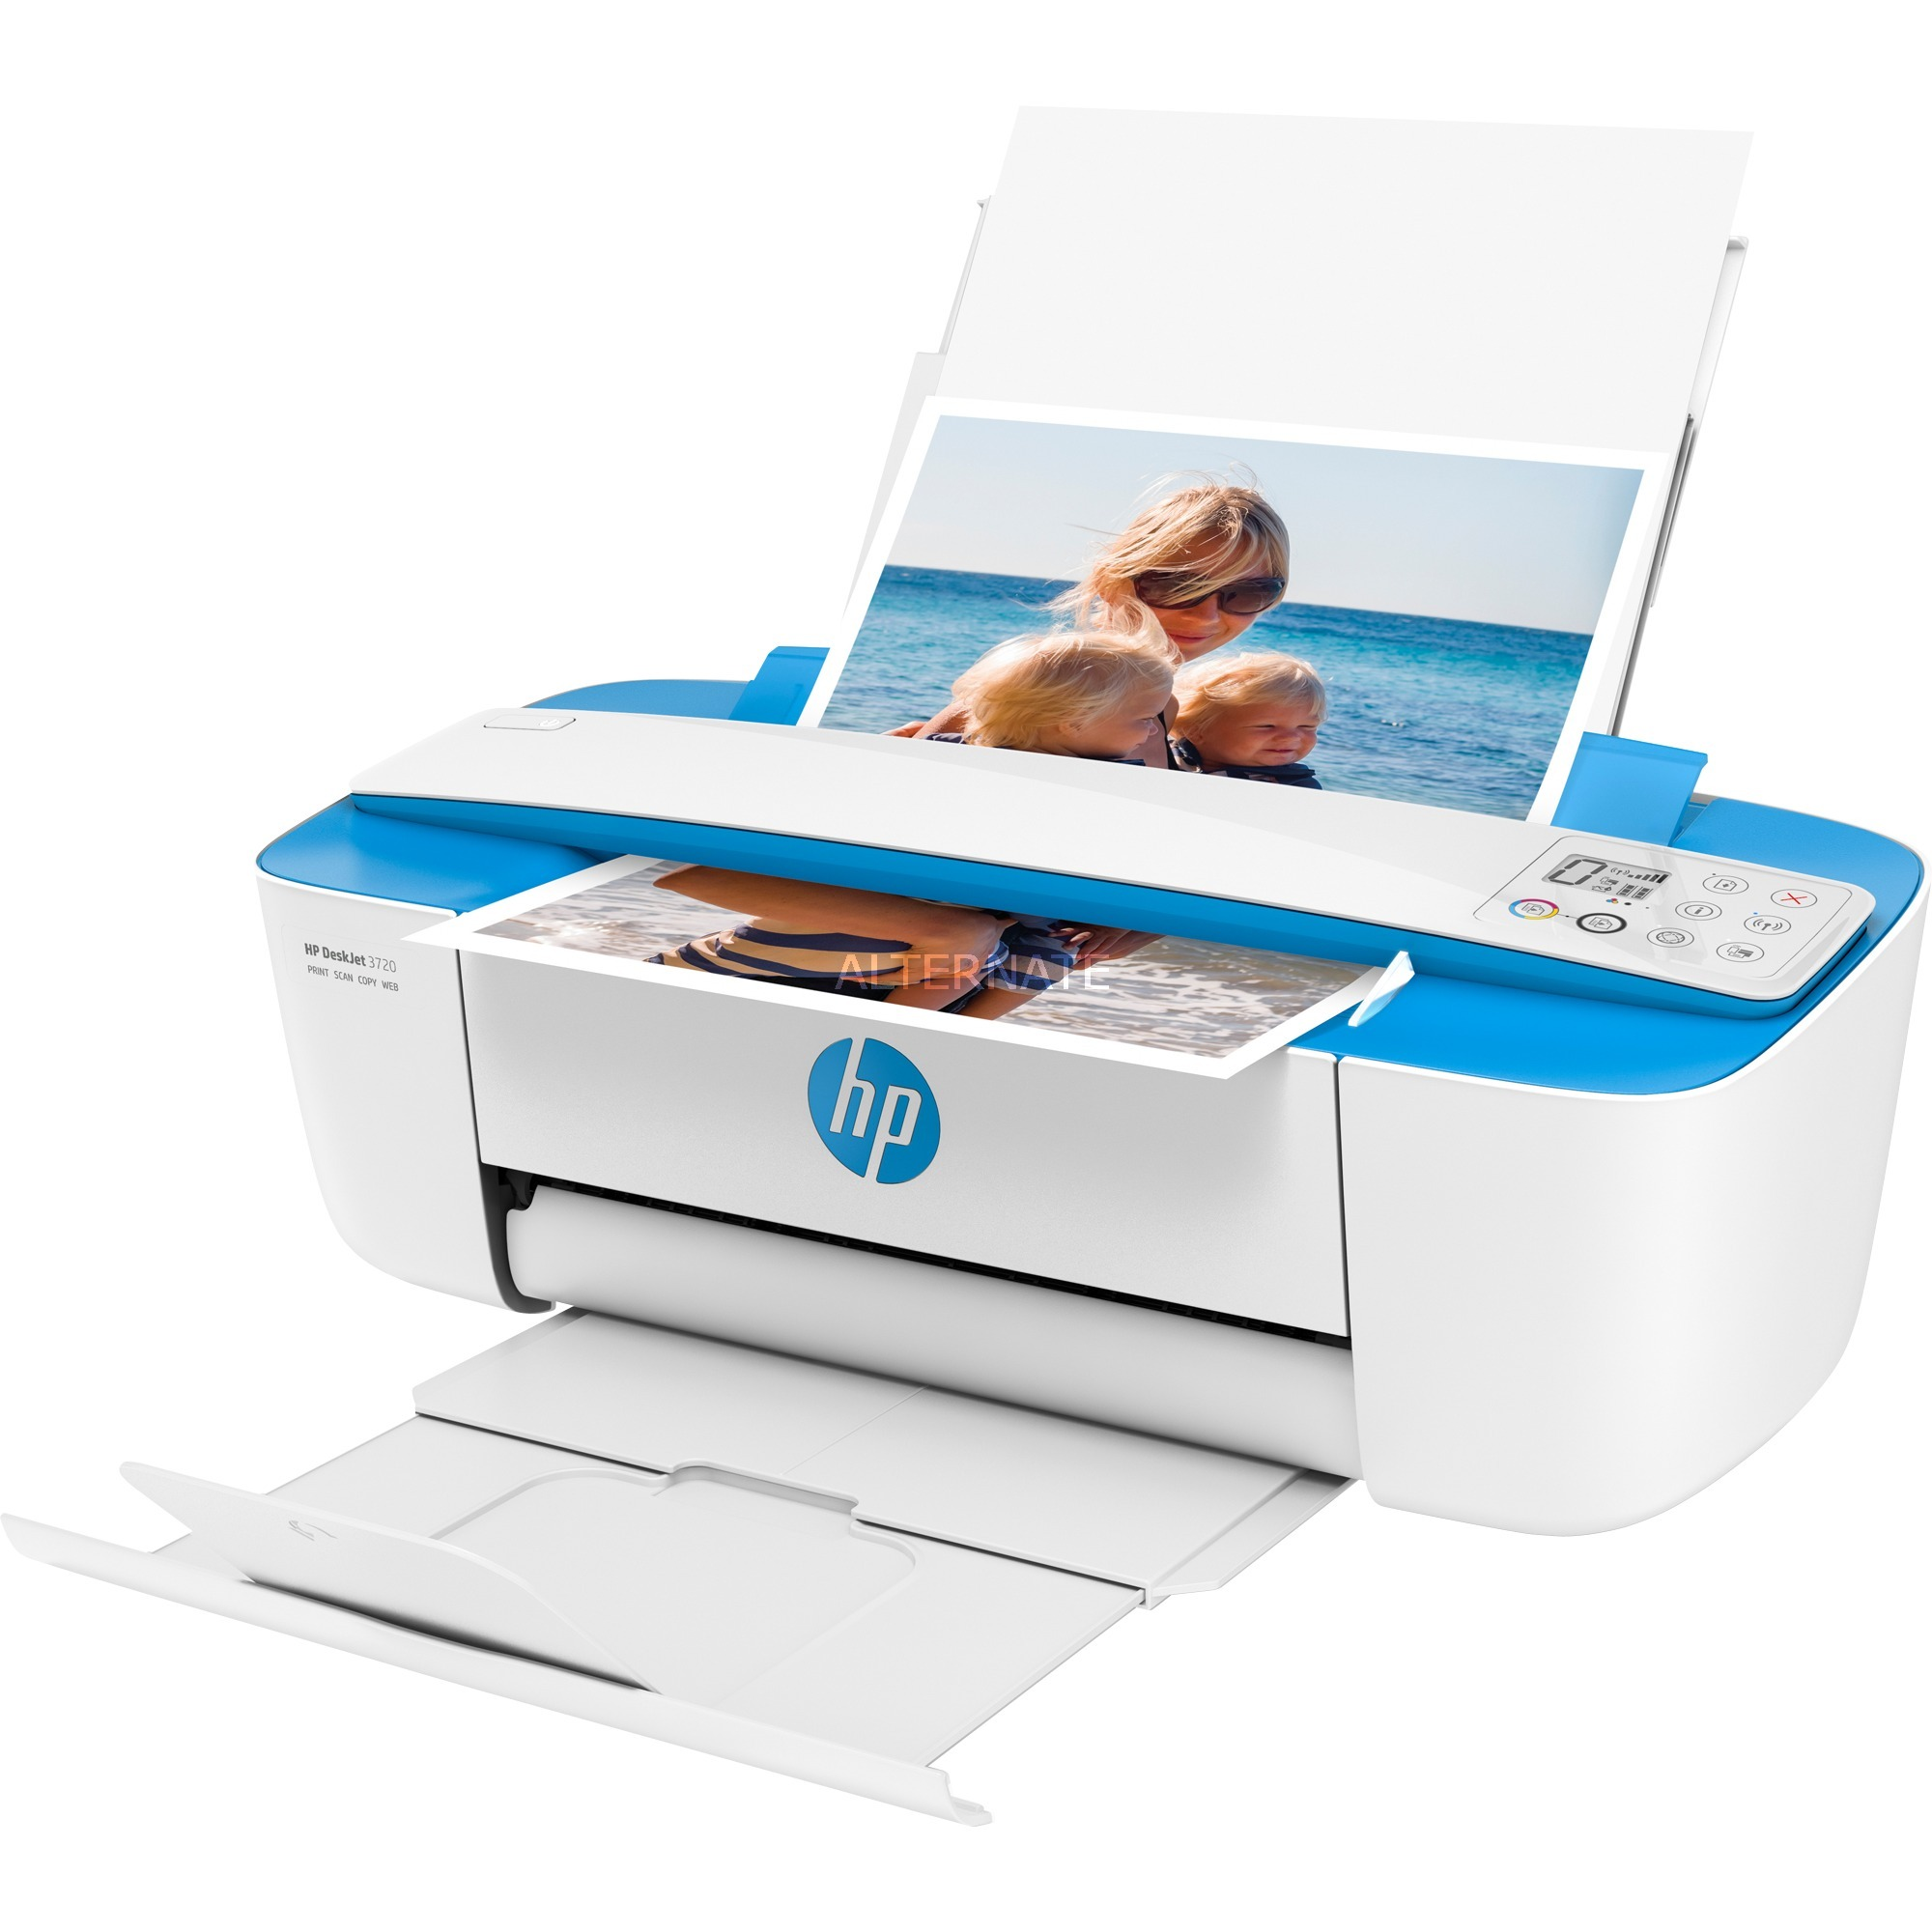 DeskJet 3720 Inyección de tinta térmica 8 ppm 4800 x 1200 DPI A4 Wifi, Impresora multifuncional